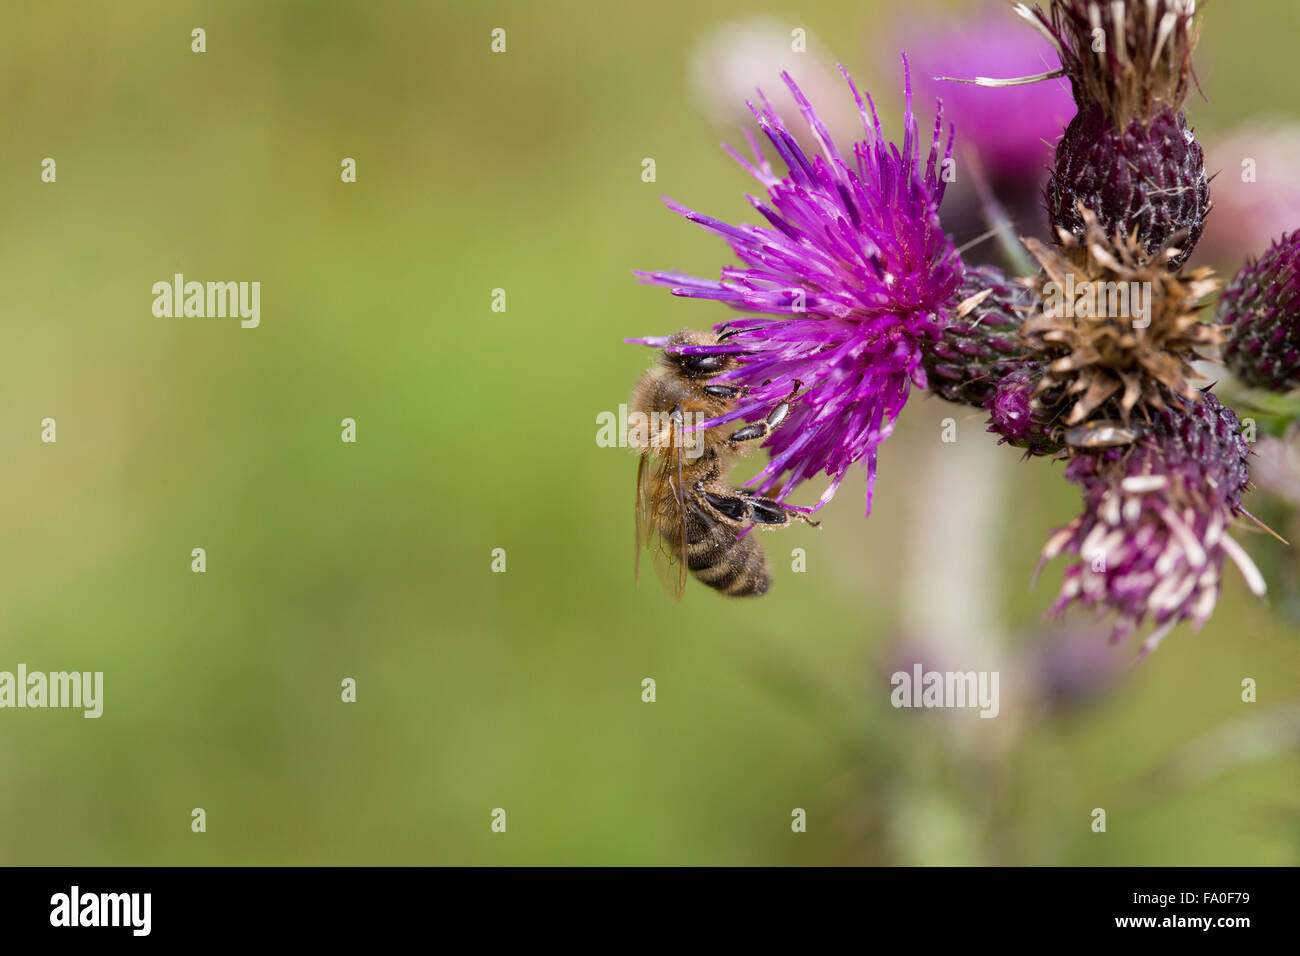 Greater Marsh Thistle; Cirsium palustre Honey Bee on Flower Cornwall; UK - Stock Image